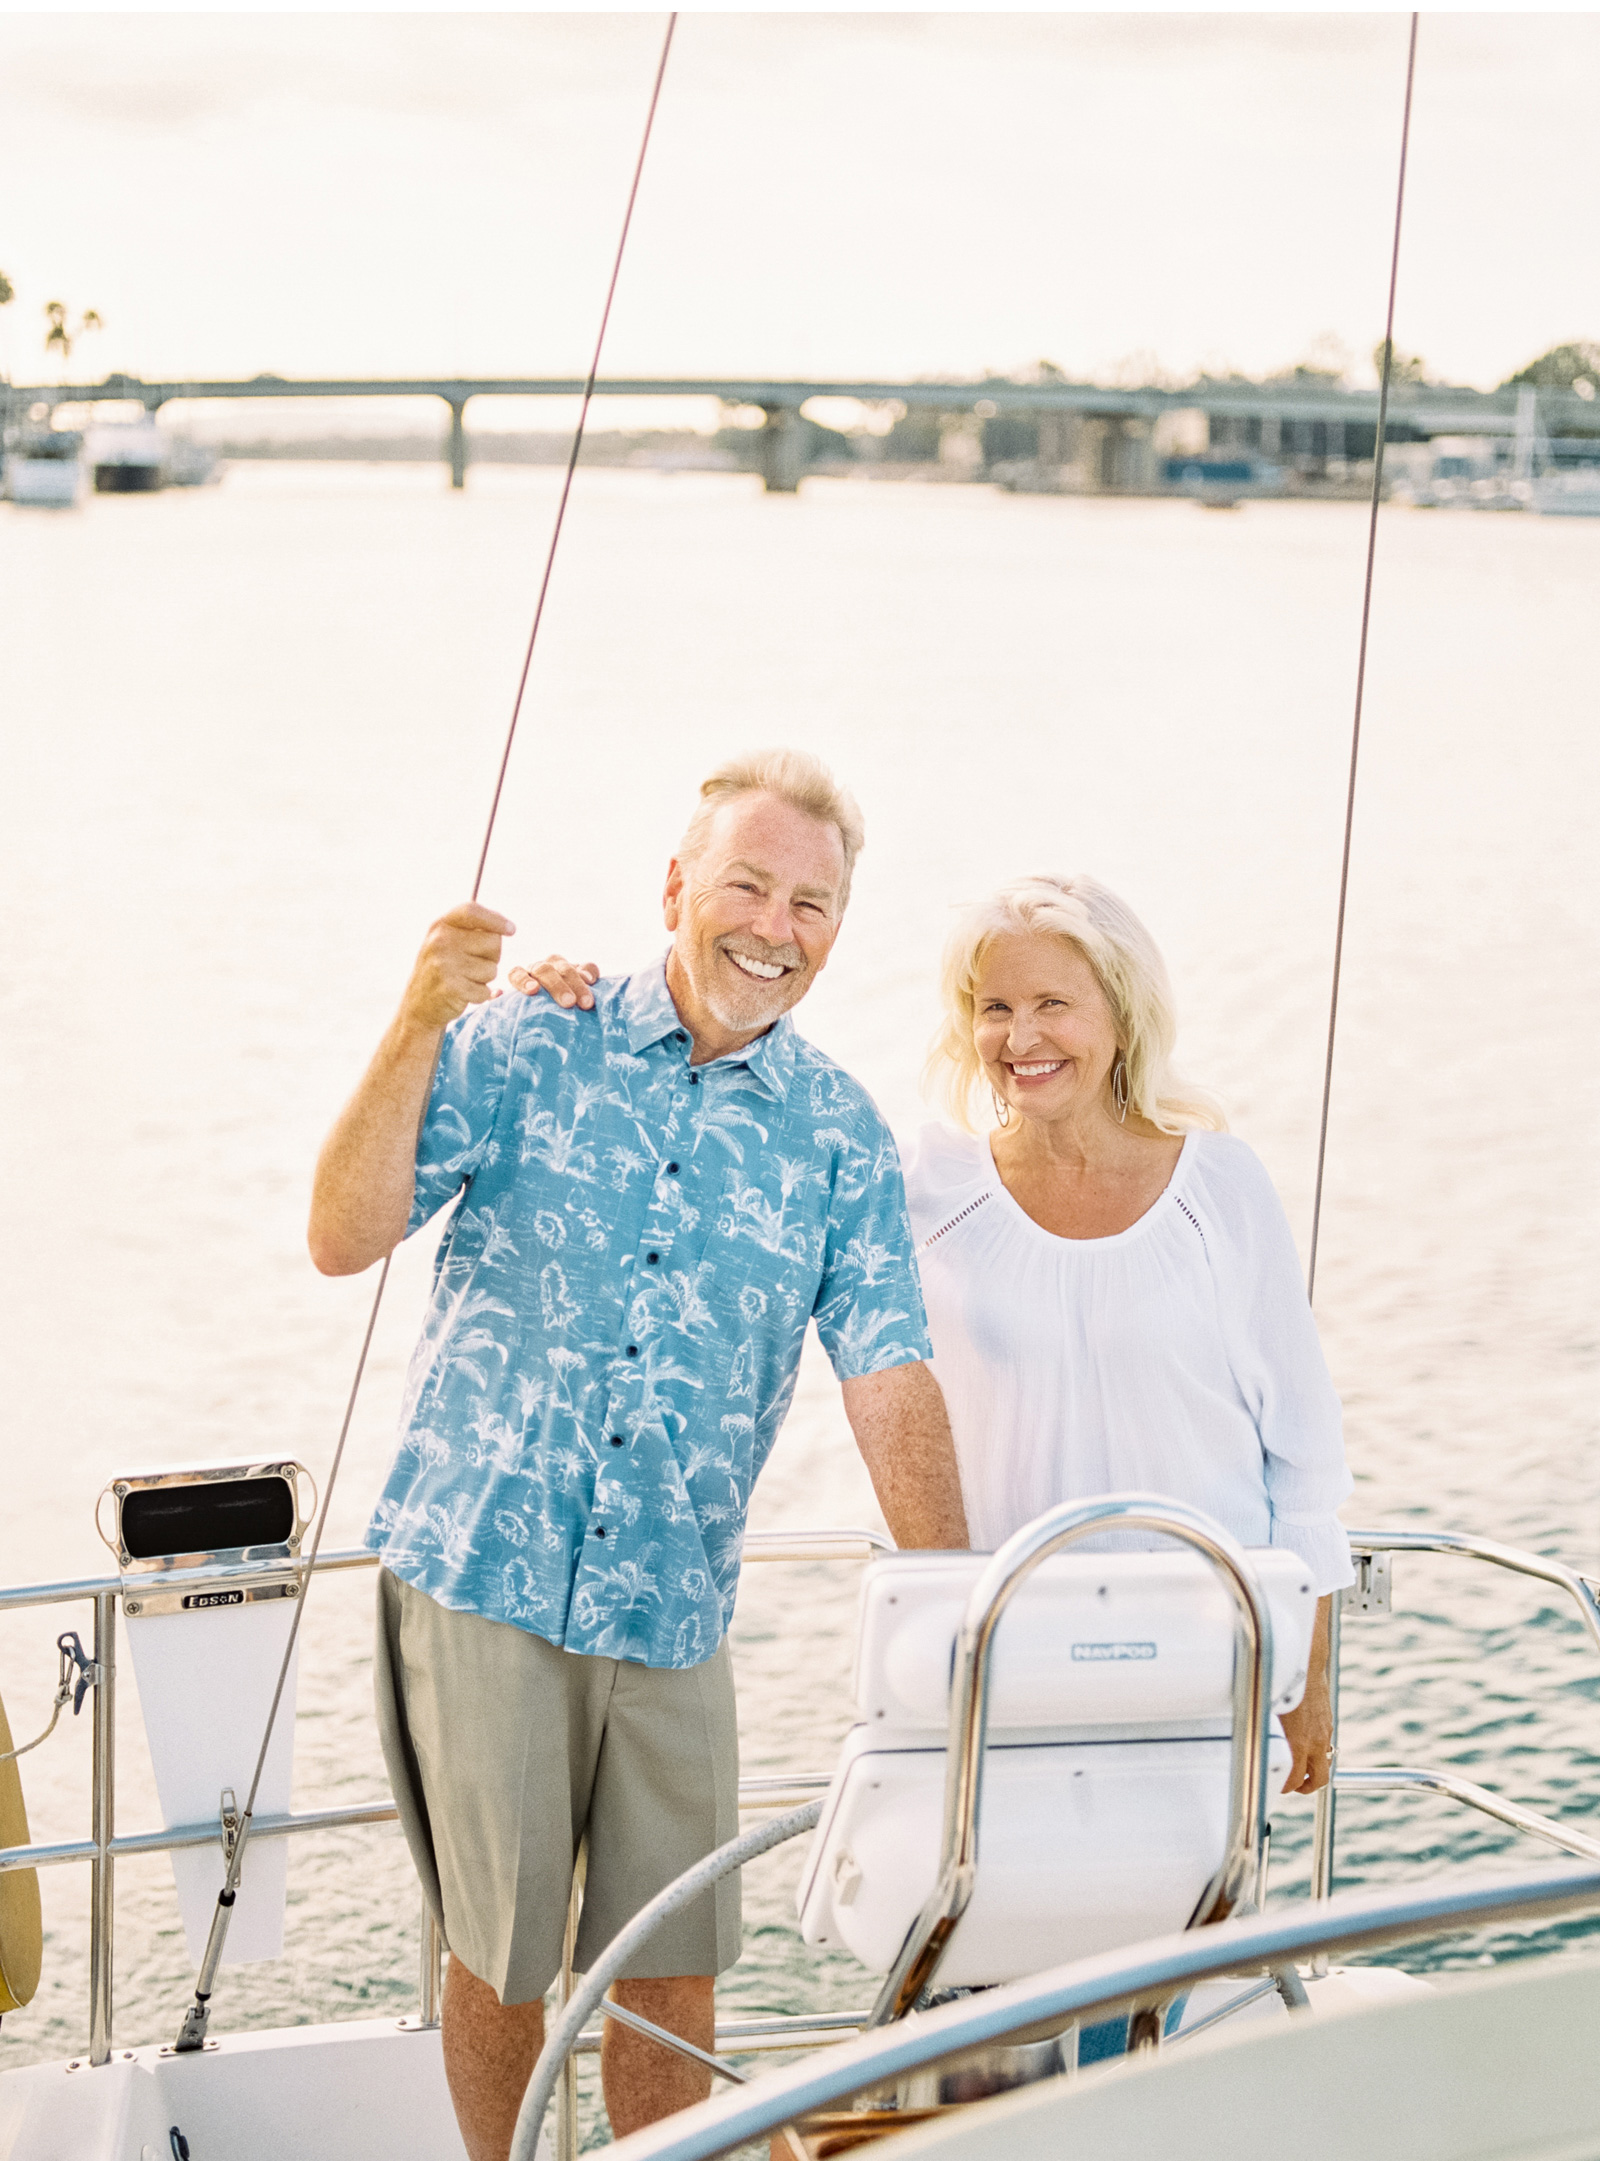 Anniversaries-on-the-Water-Long-Beach-Anniversary-Southern-California-Wedding-Photographer-Fine-Art-Wedding-Photos-Anniversary-on-Boat-Natalie-Schutt-Photography_13.jpg